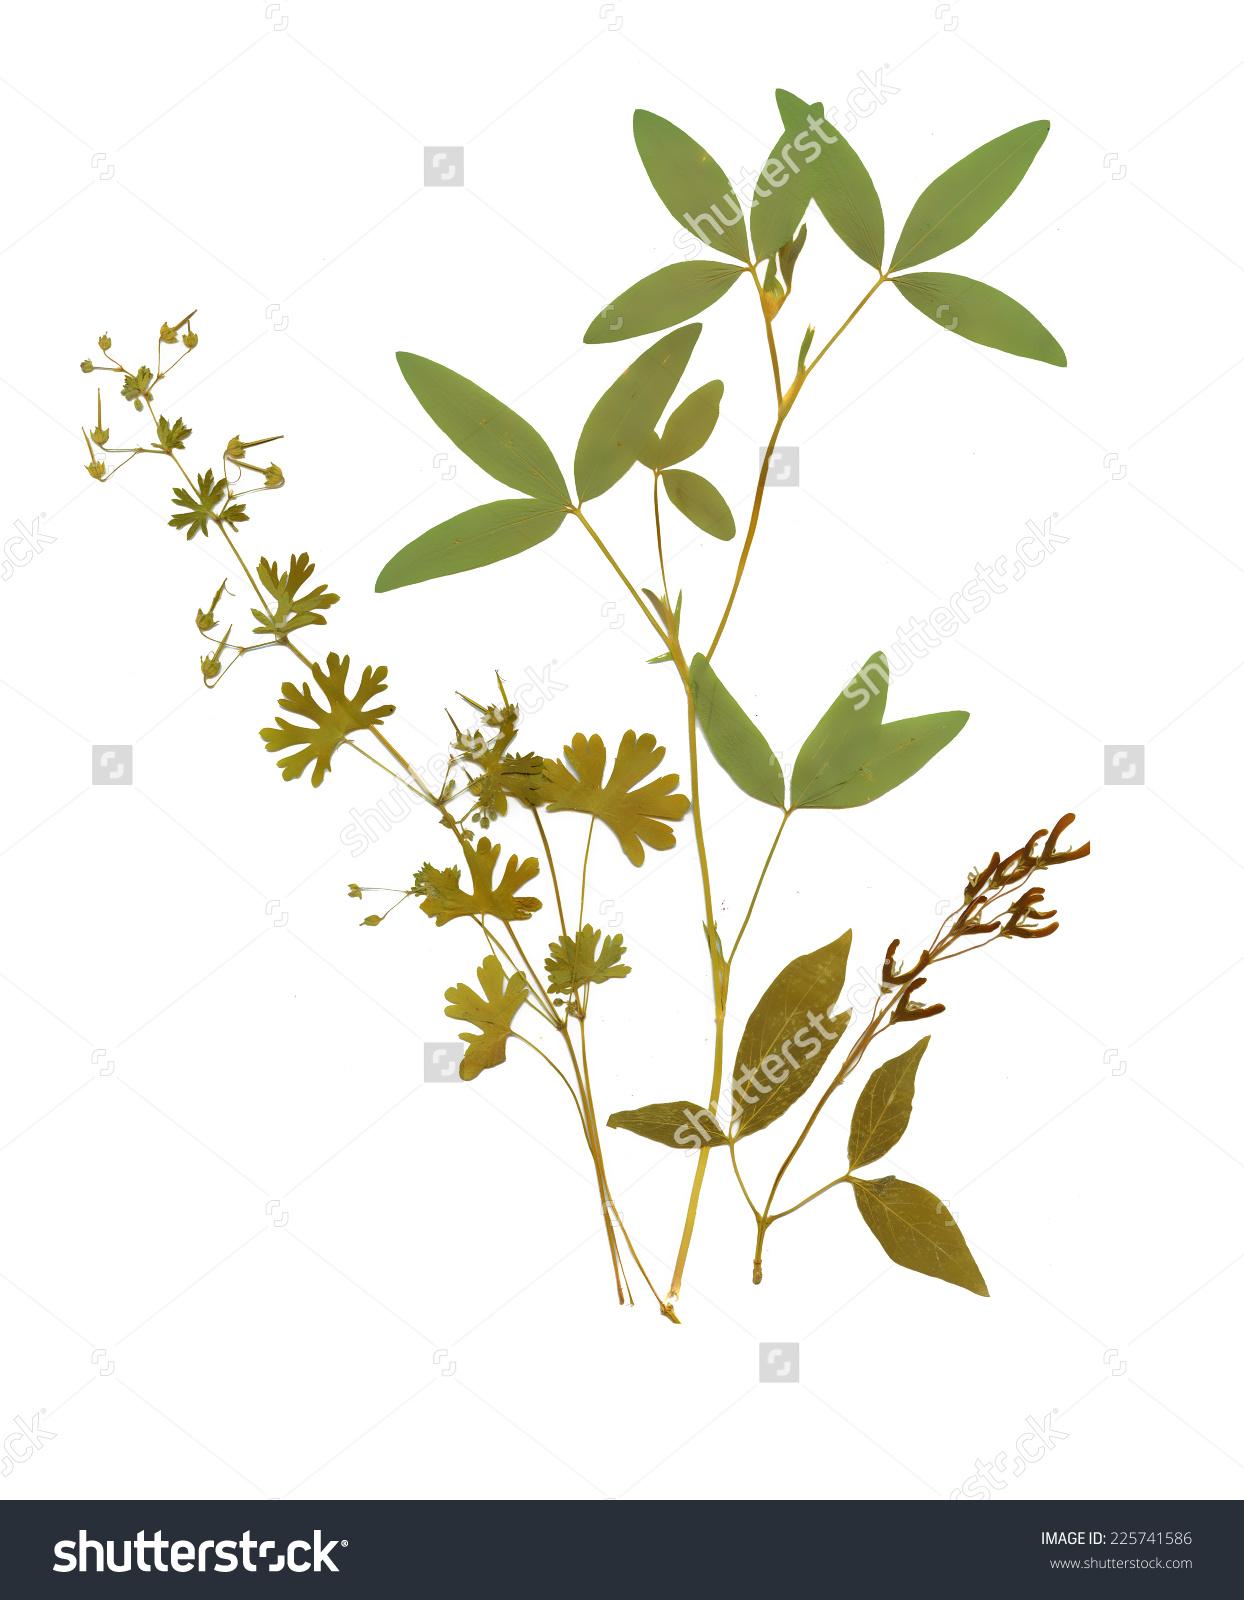 Dry Herbarium Plants Flowers Leaves Vector Stock Vector 225741586.